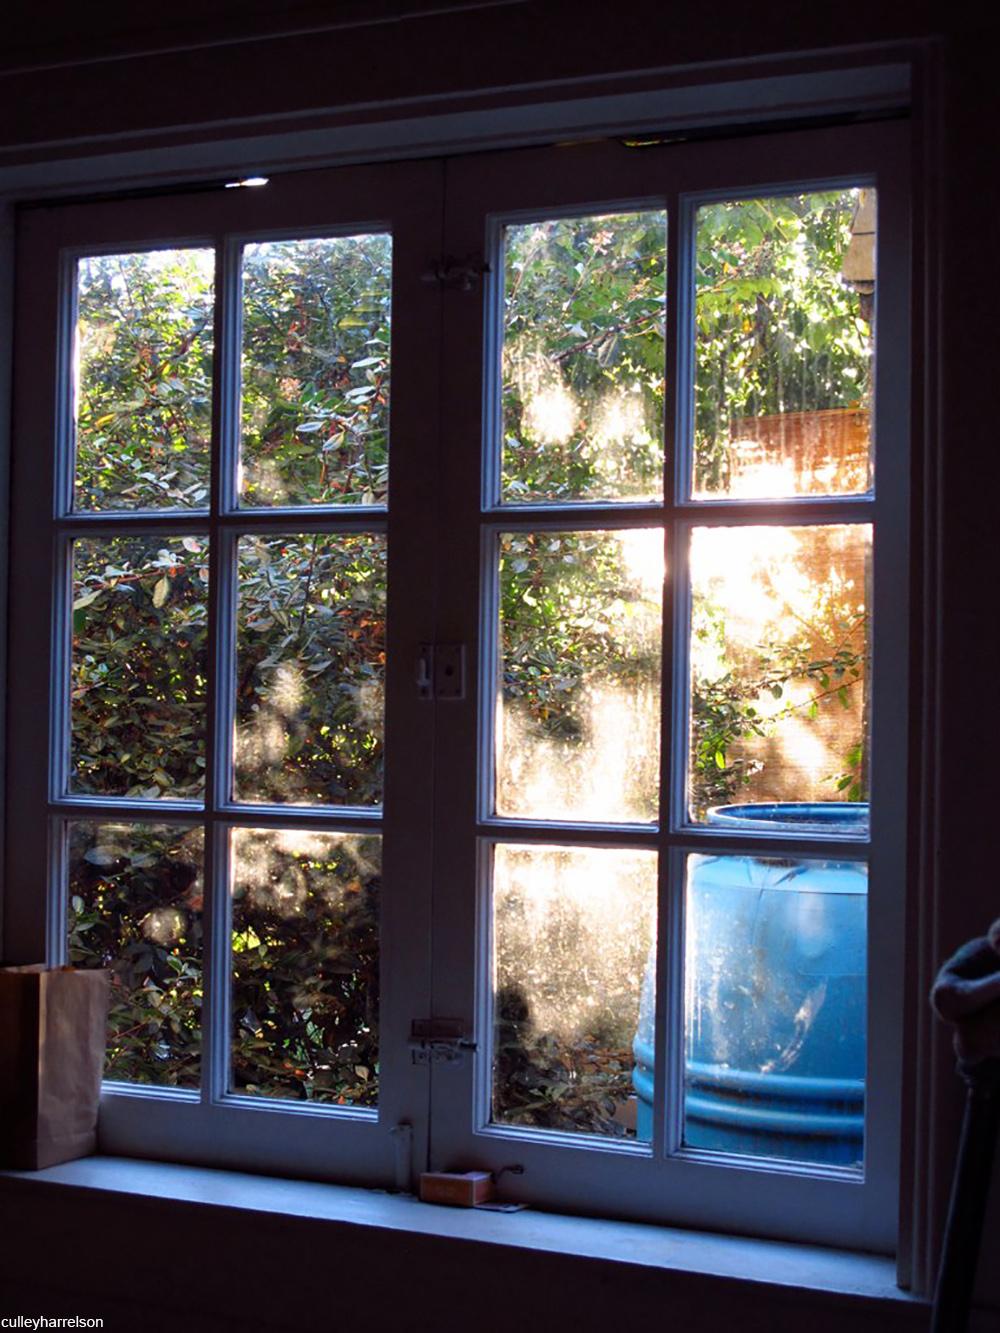 windows showing view of rain barrel outside